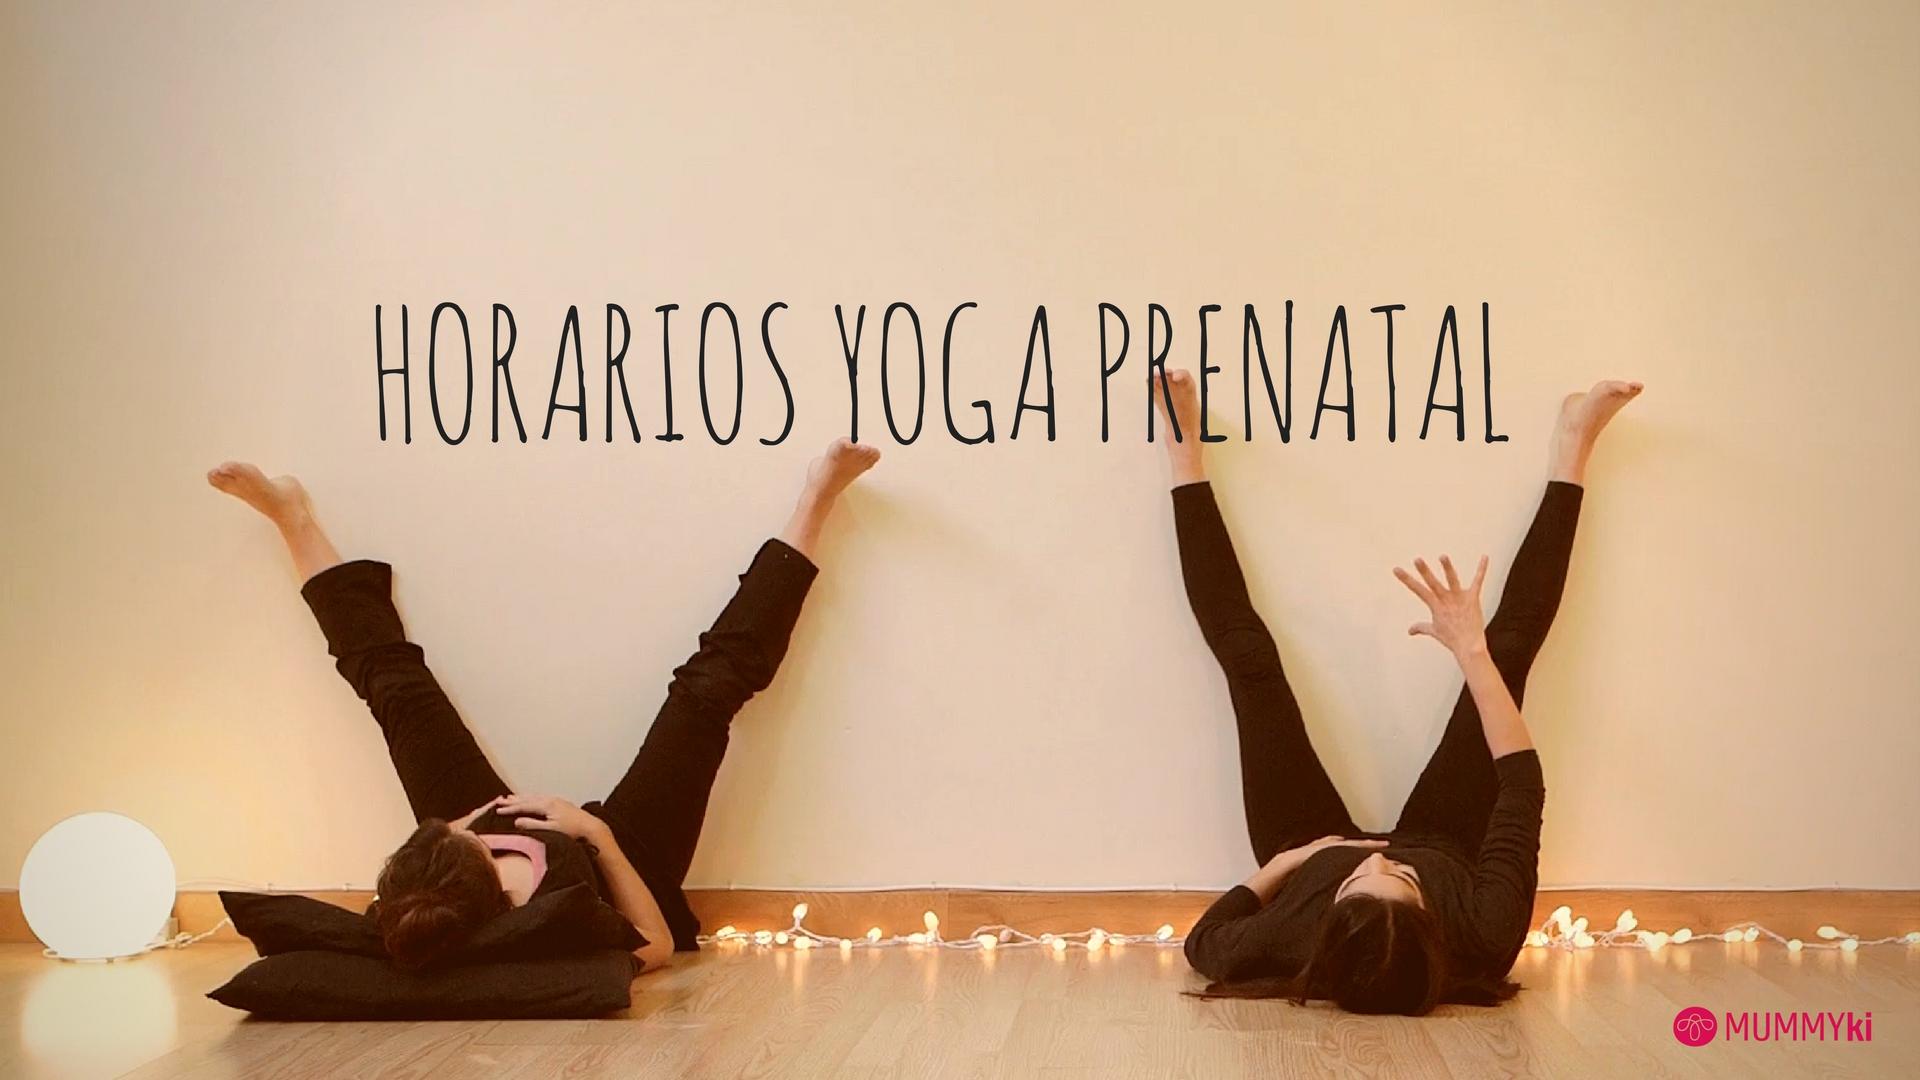 horarios yoga prenatal con Anna Santos de Mummyki